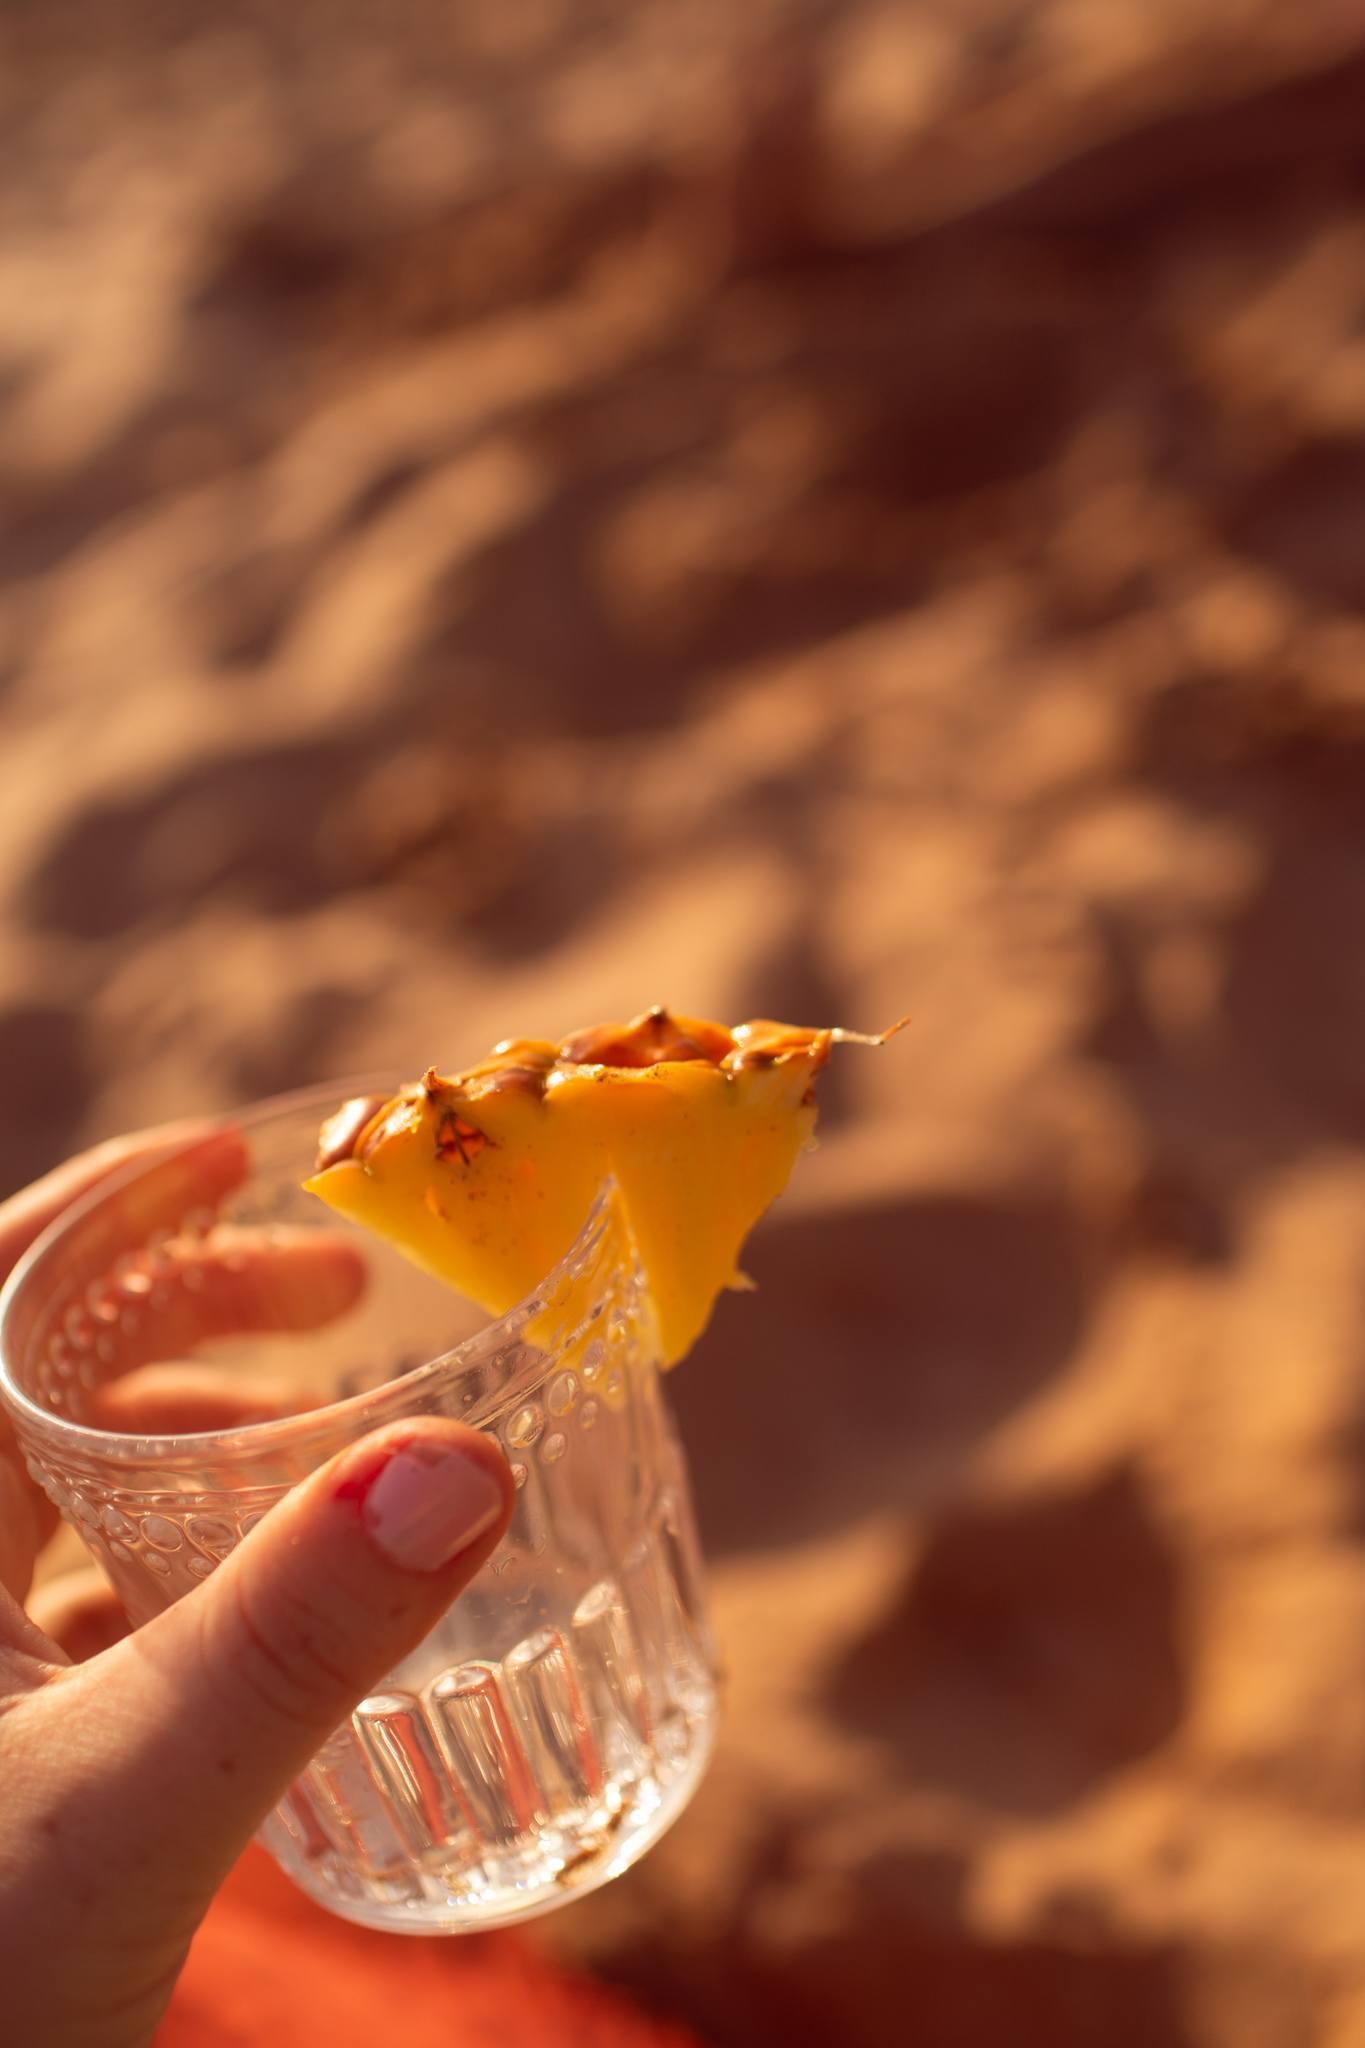 glass with pineapple garnish